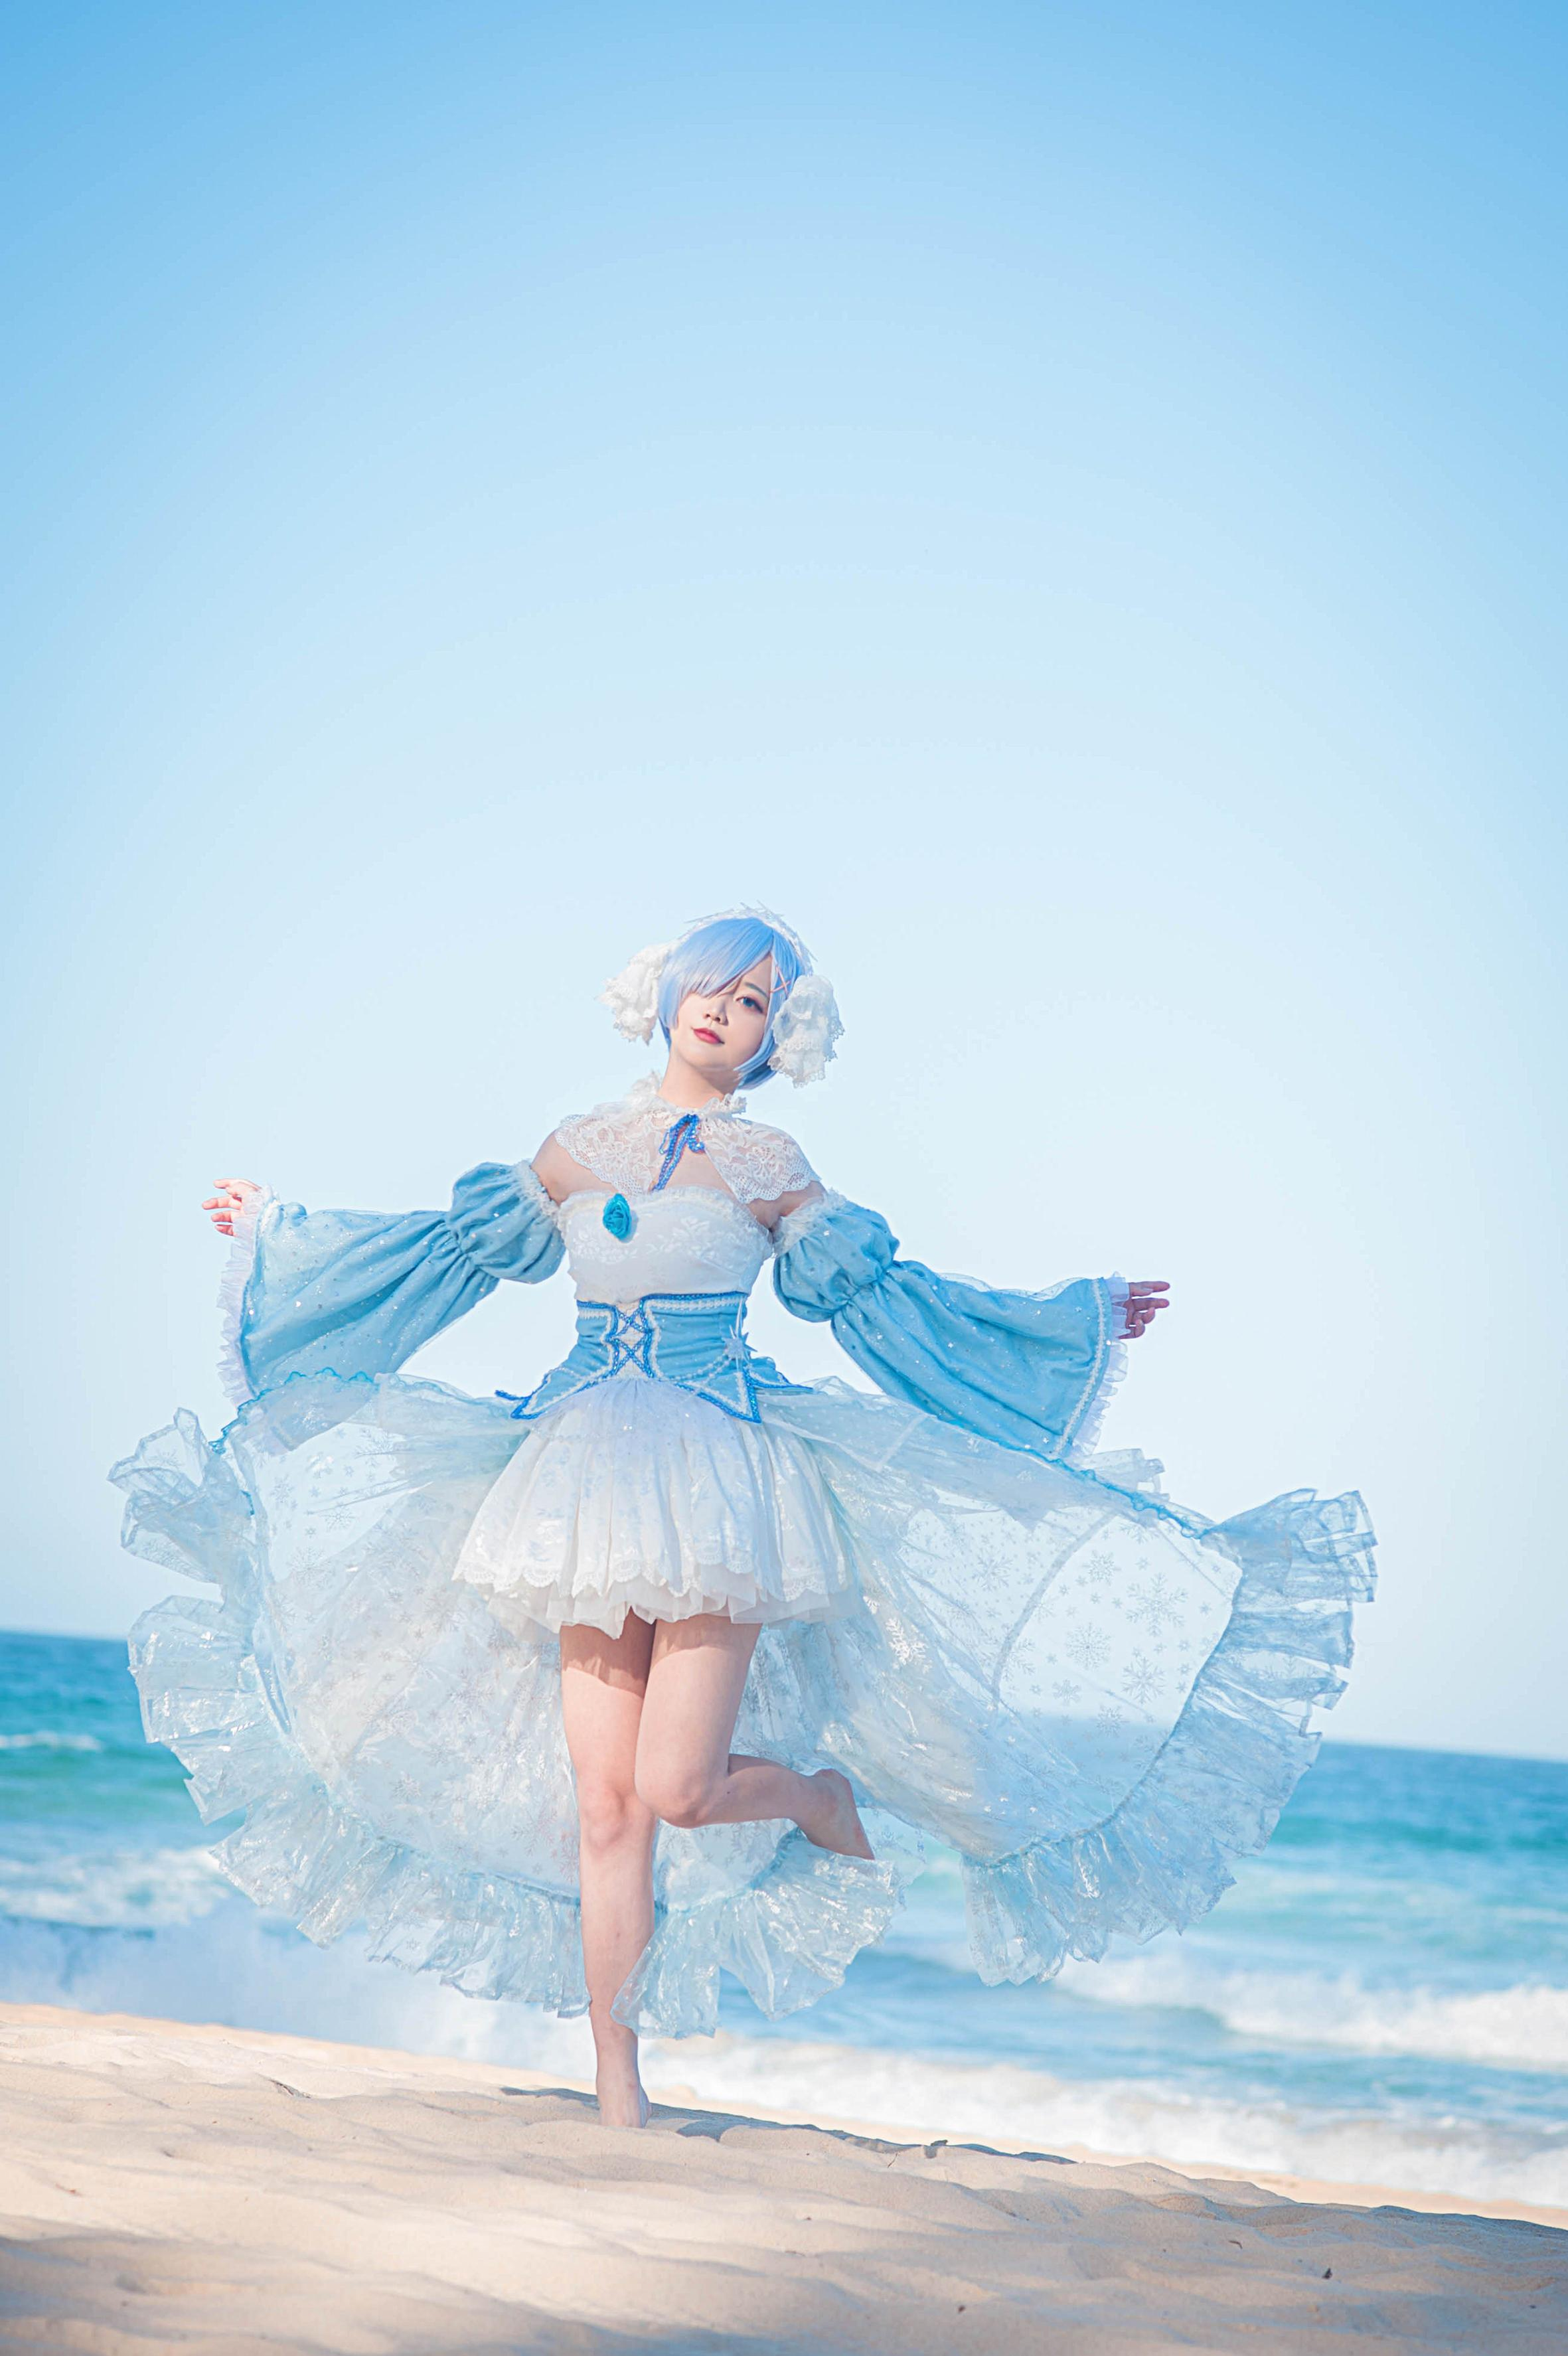 《RE:从零开始的异世界生活》从零开始的异世界生活蕾姆cosplay【CN:Kyuu_九笛】-第4张